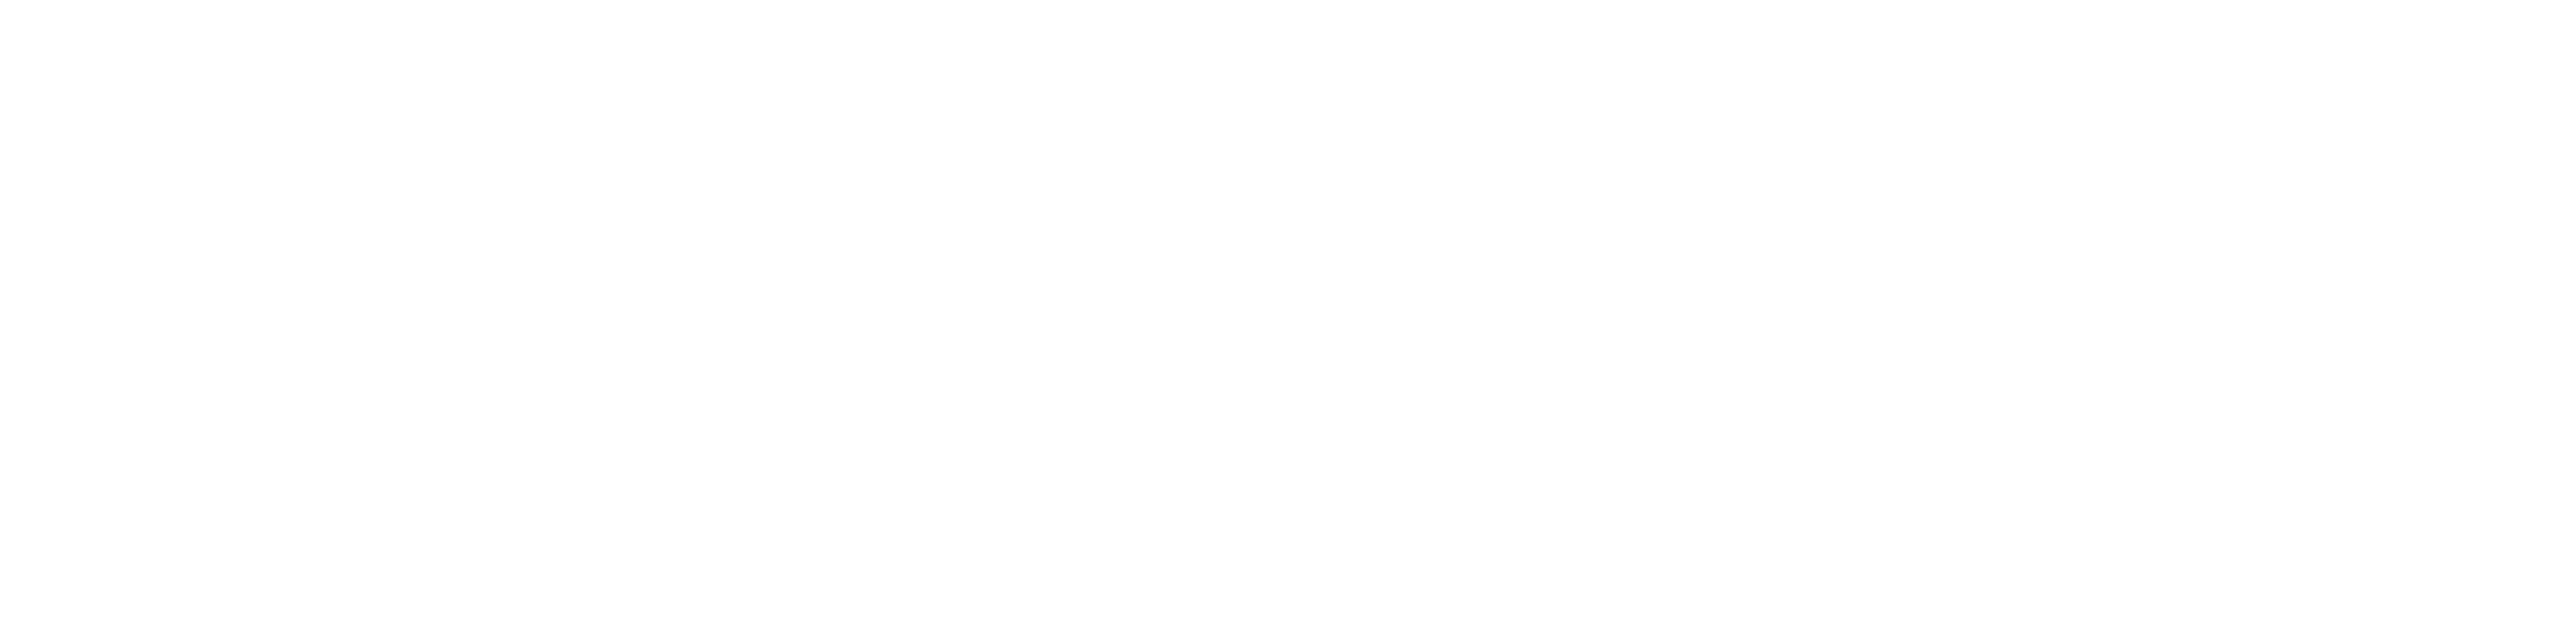 Rap Maker's logotype